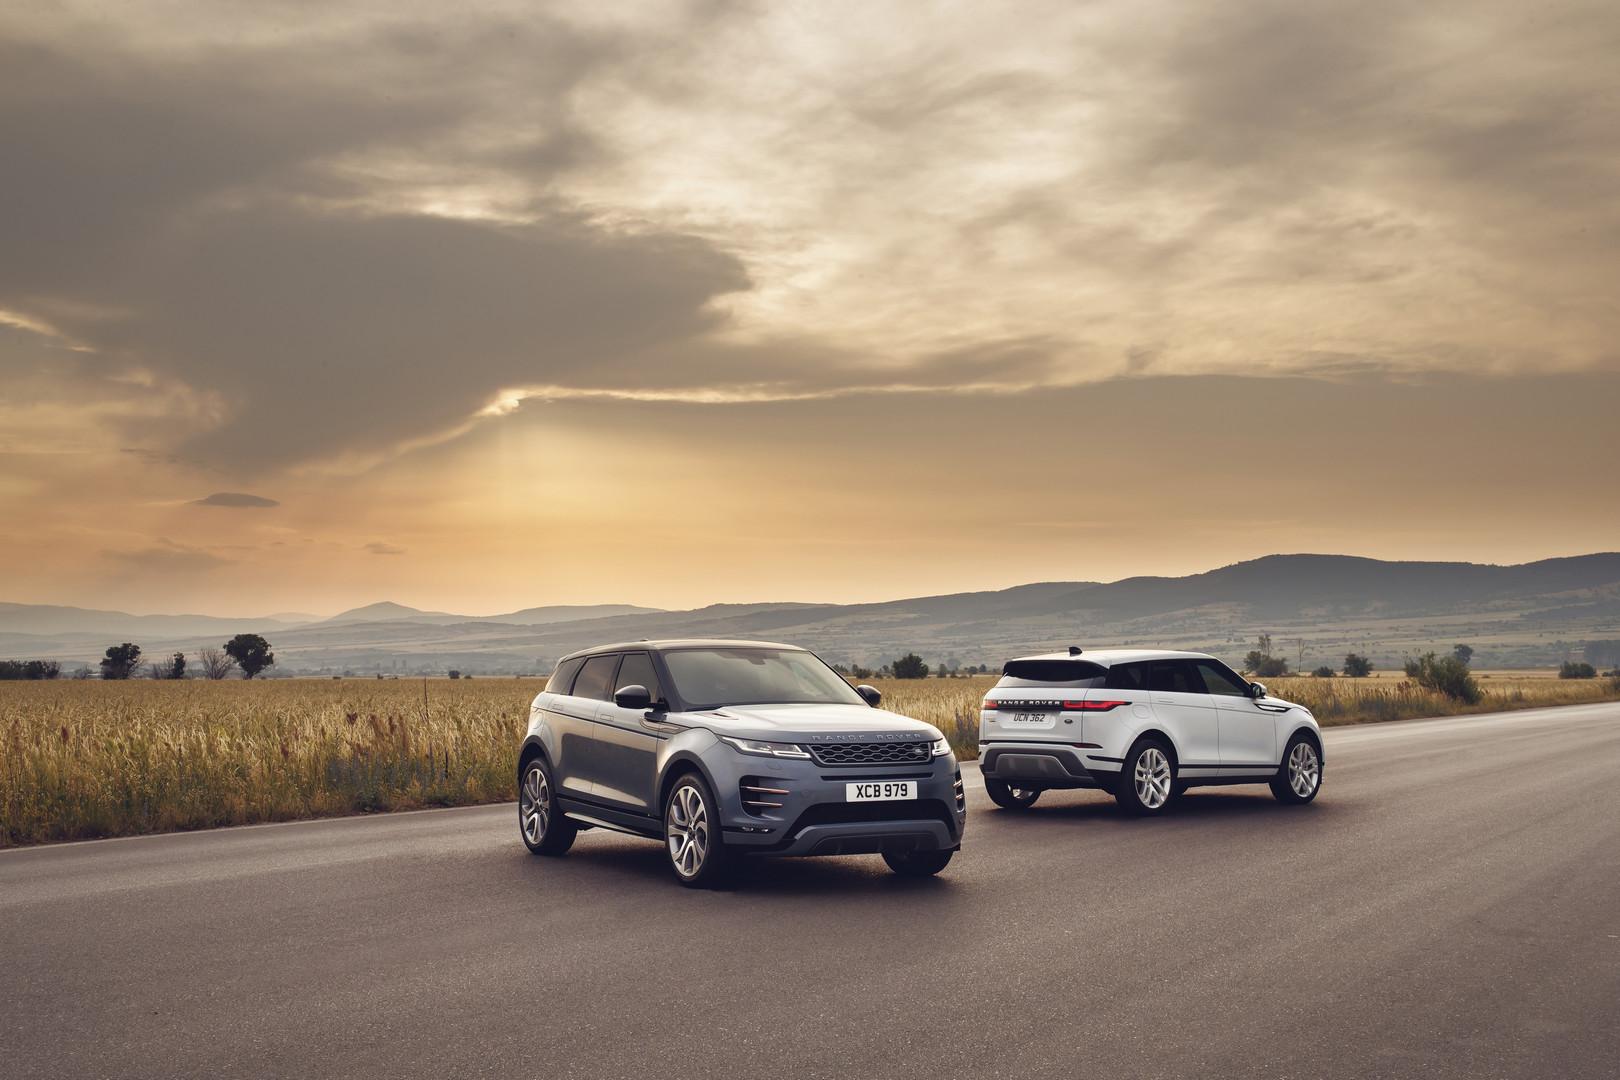 2019 Range Rover Evoque